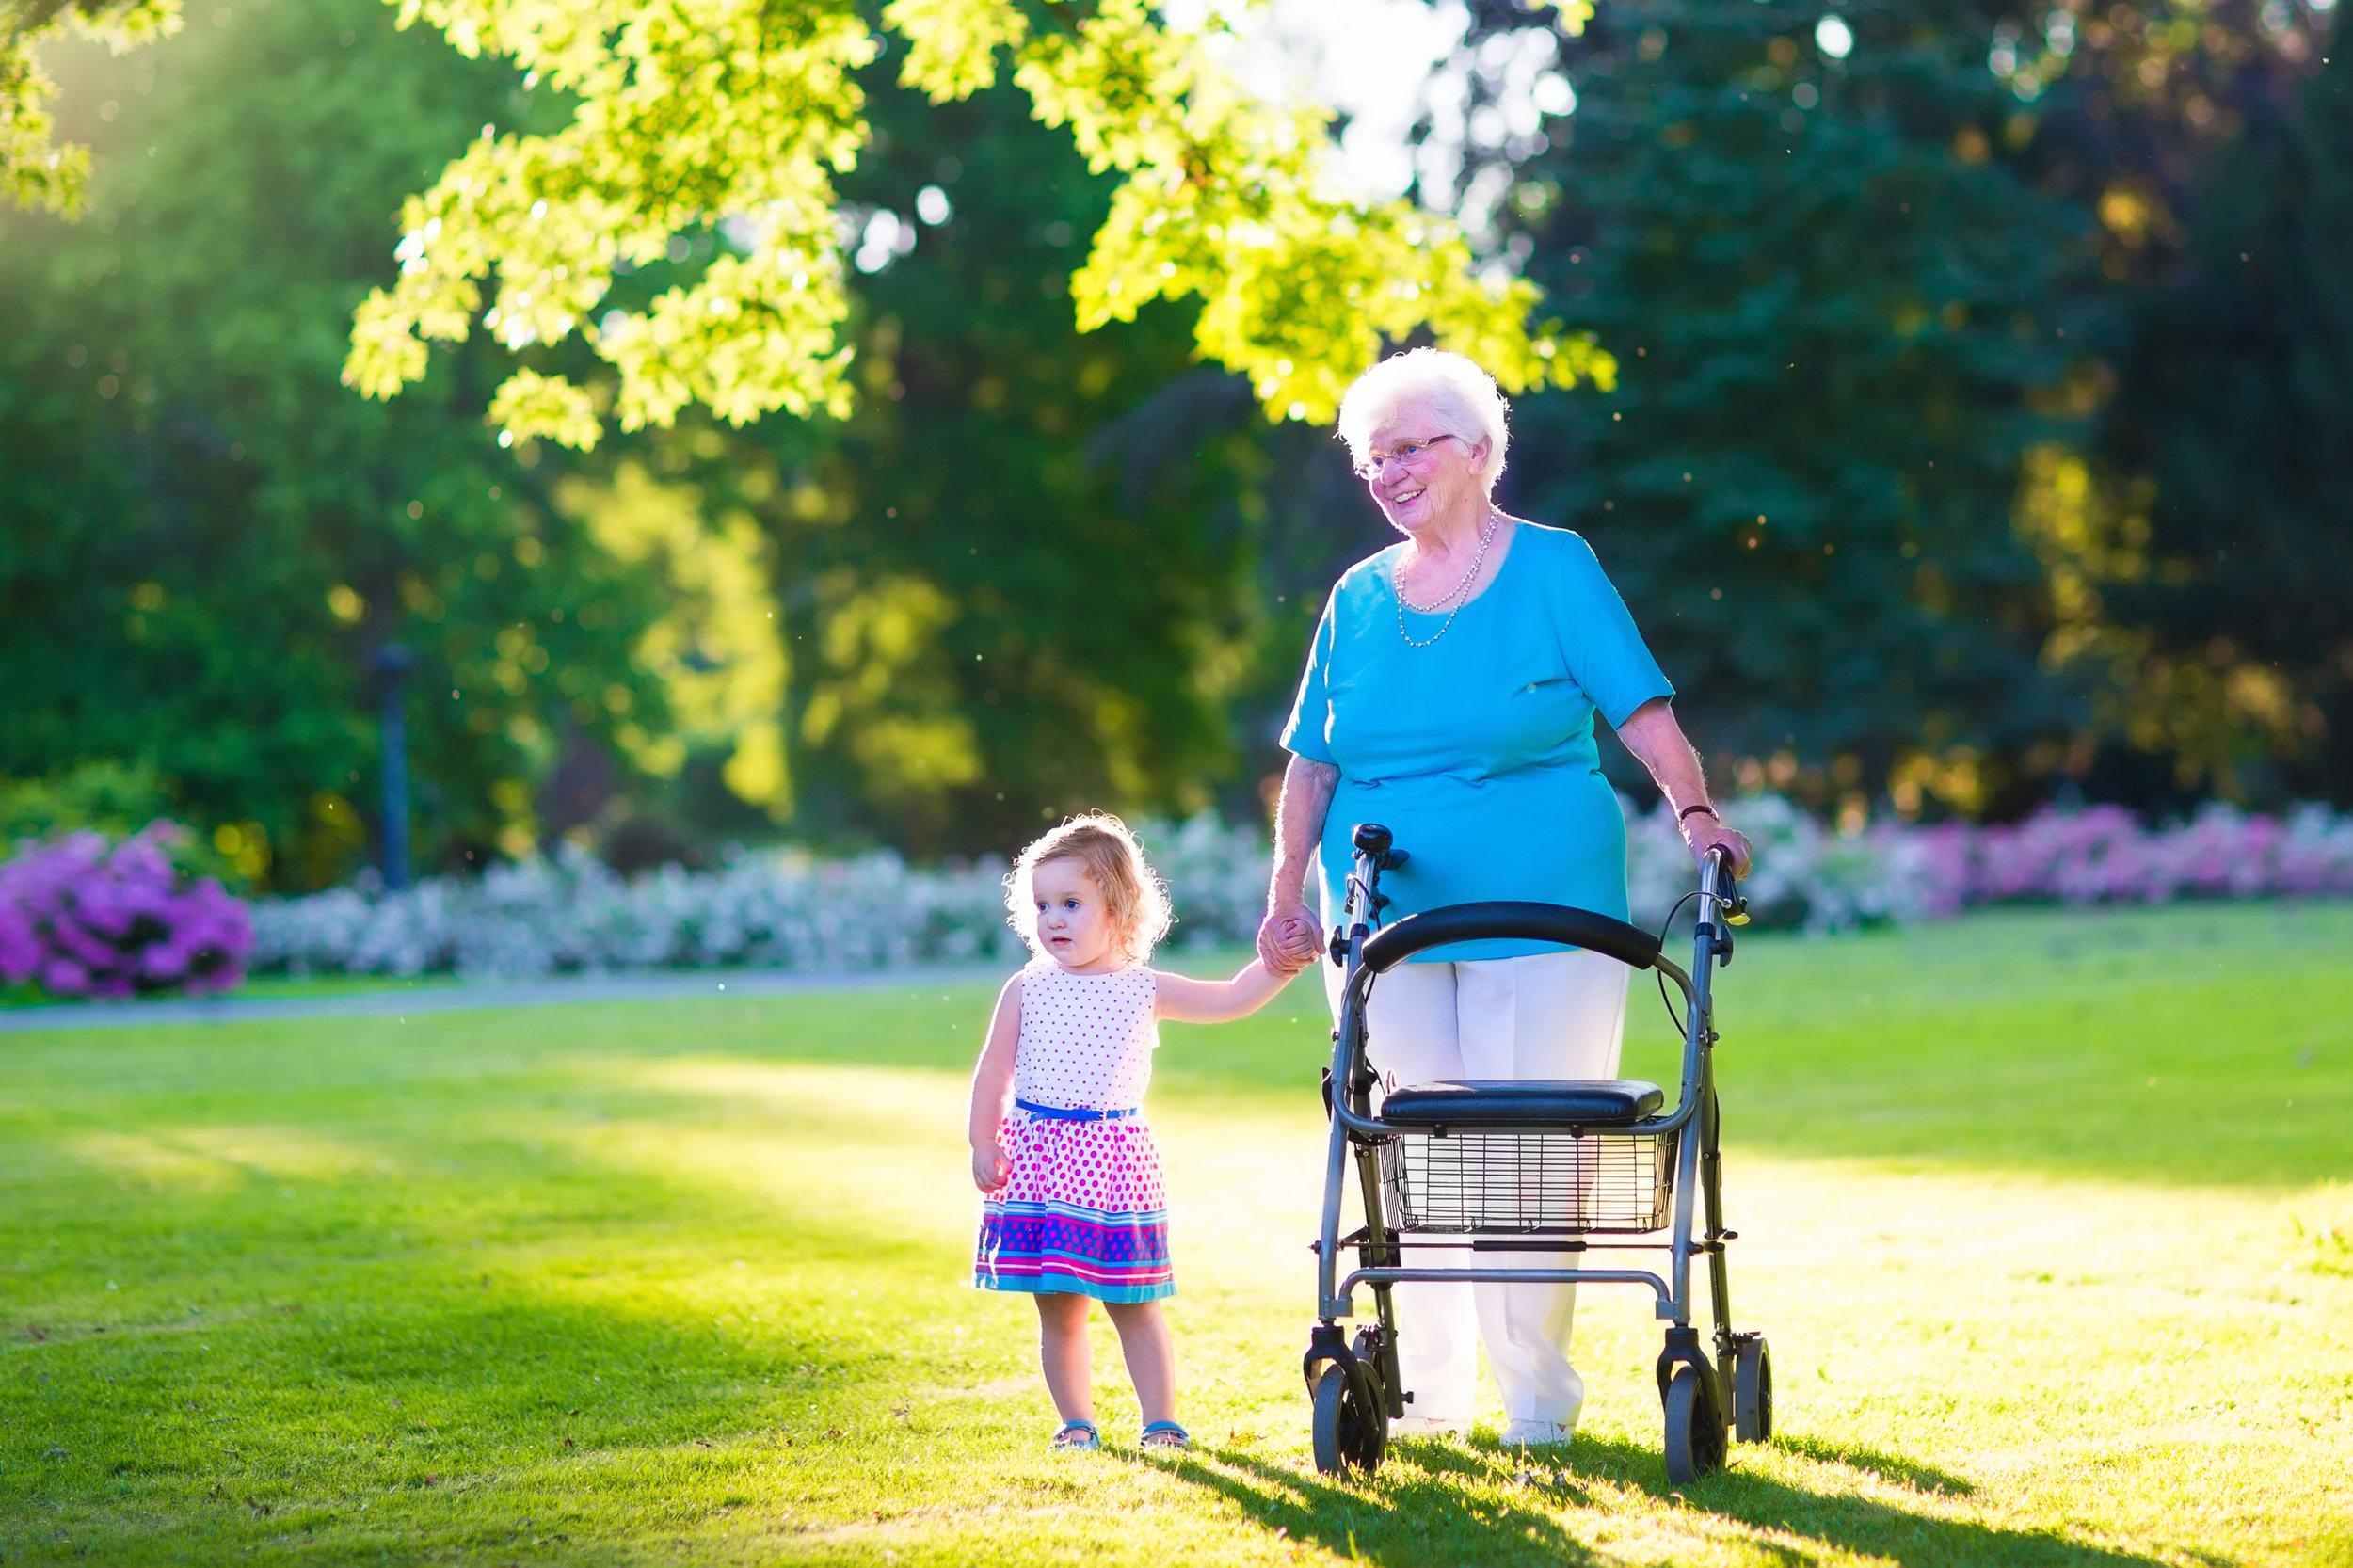 walker grandma with child on grass.jpg